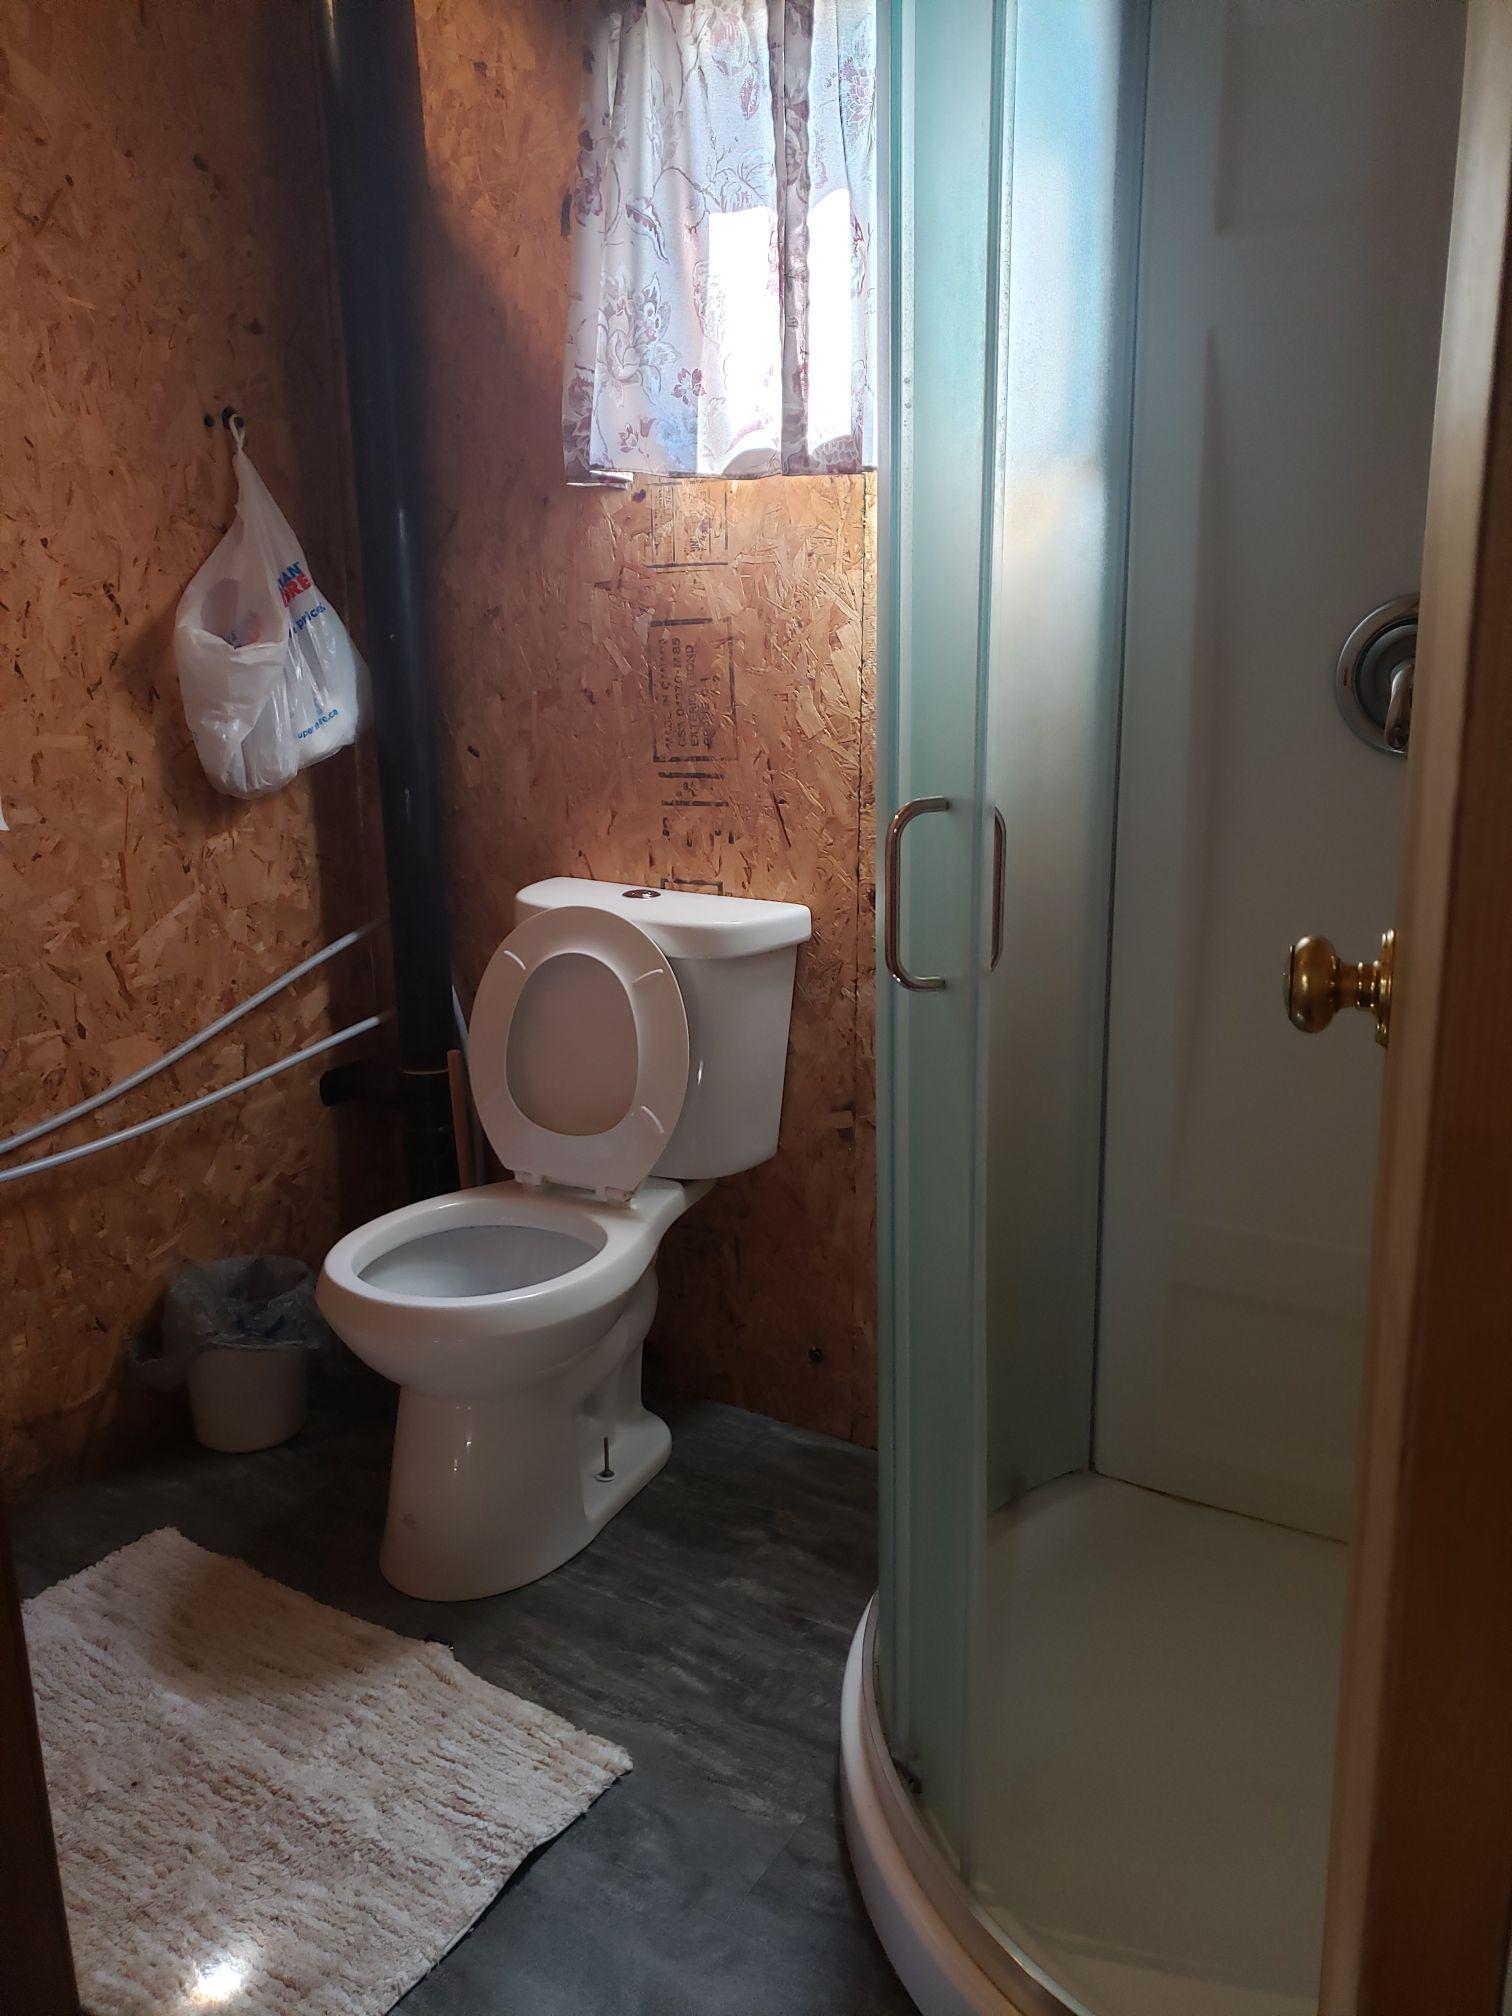 Bobcat-Bathroom2-Trappers Point Camp-Sturgeon Lake-Savant Lake-Ontario